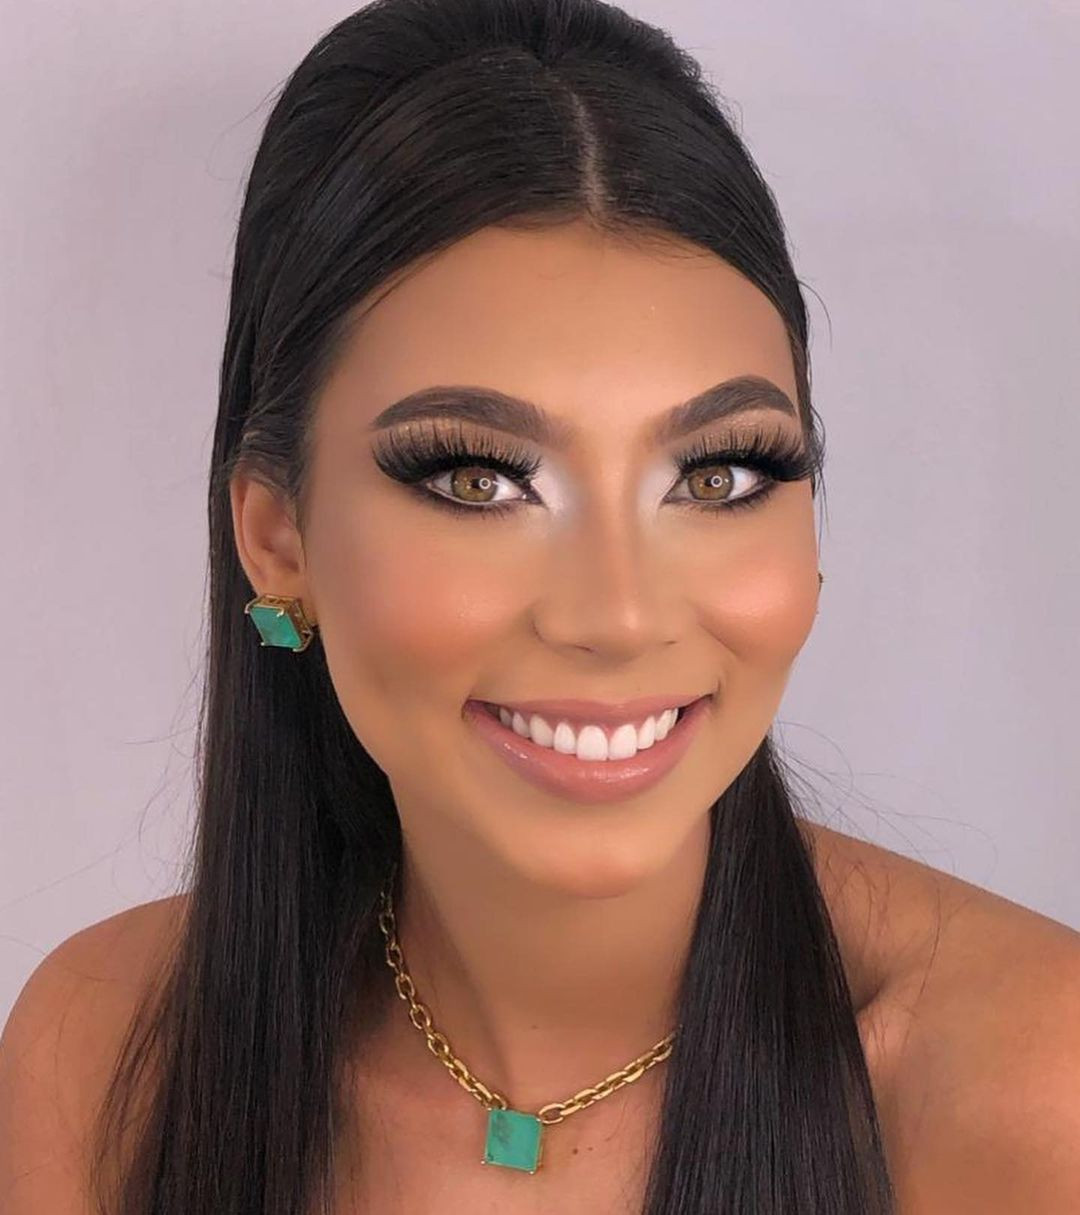 julia alves, miss cerrado goiano mundo 2019. - Página 6 Fumswb10